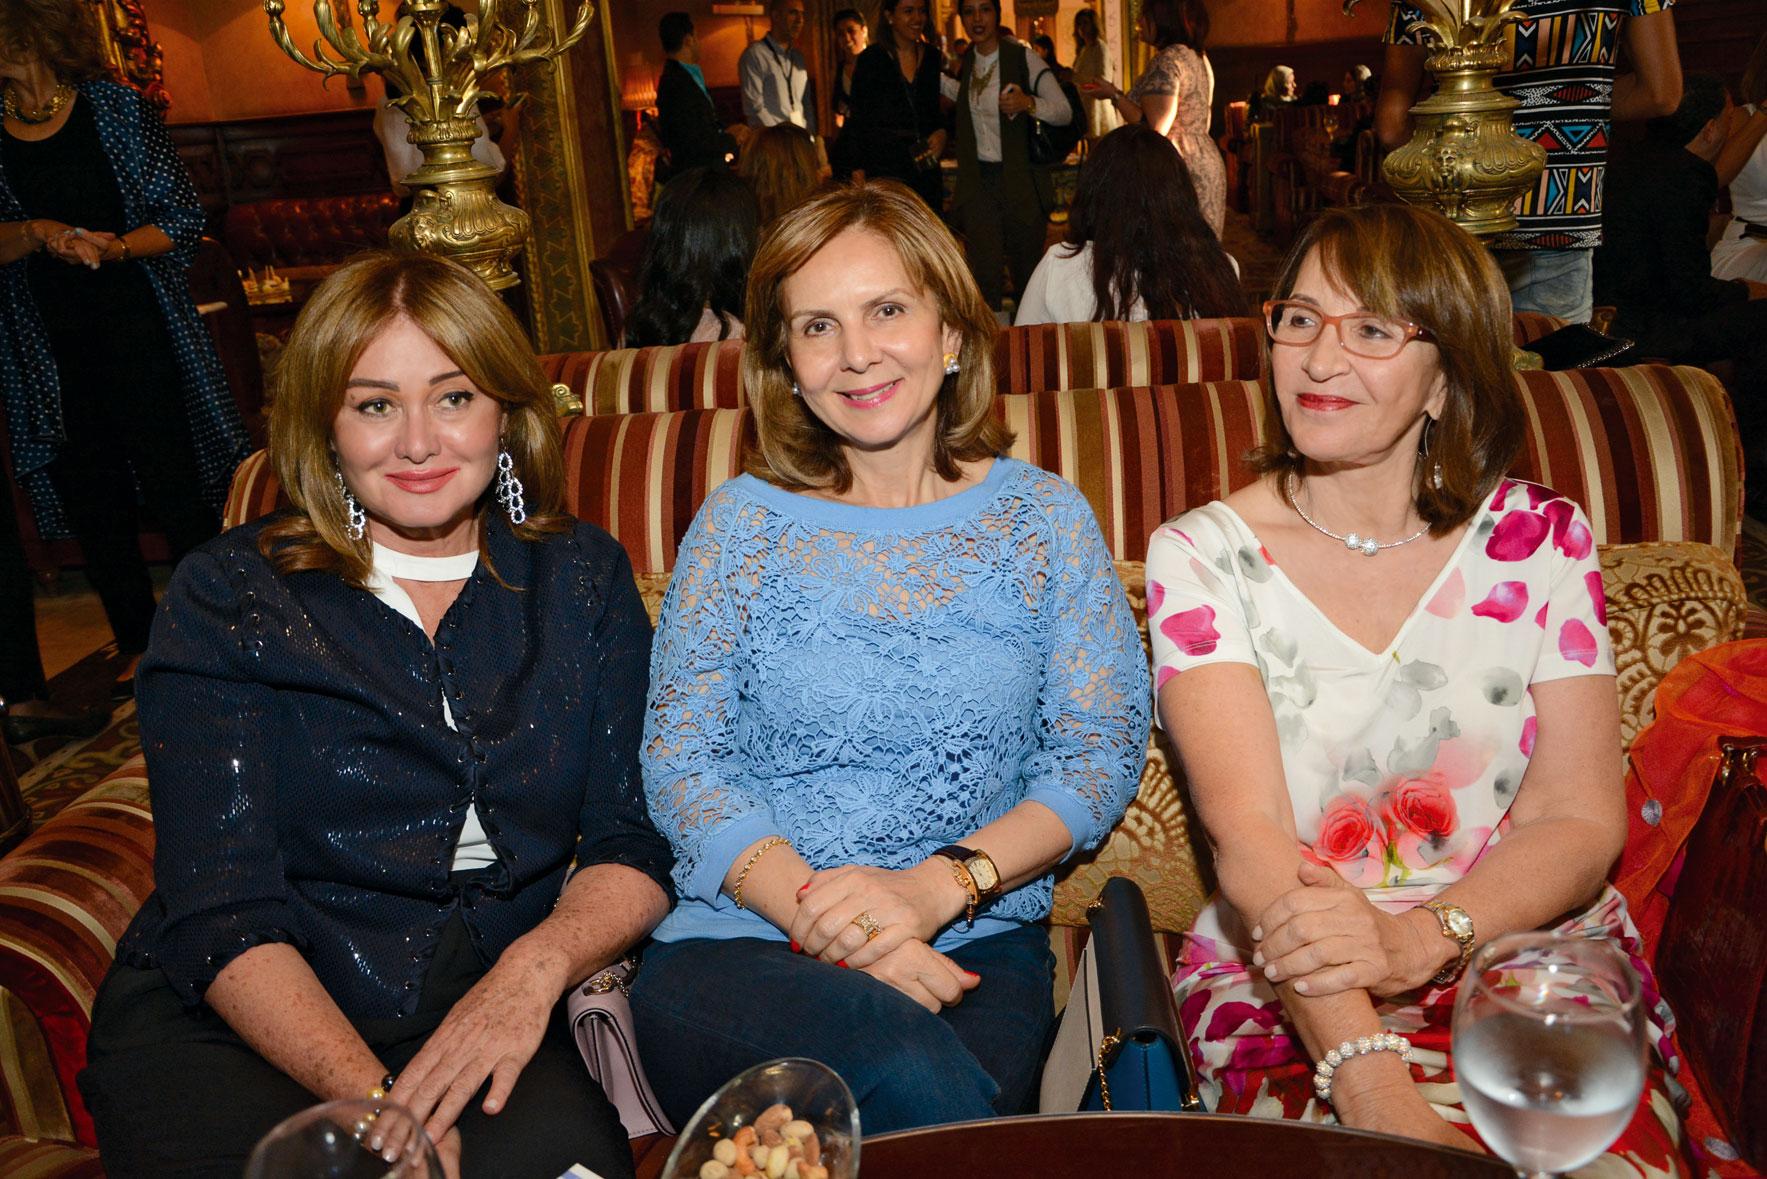 Ms.-Ulvia-Kamel,-Ms.-Fifi-Kamhawy-&--Ms.-Shadia-Badreldin